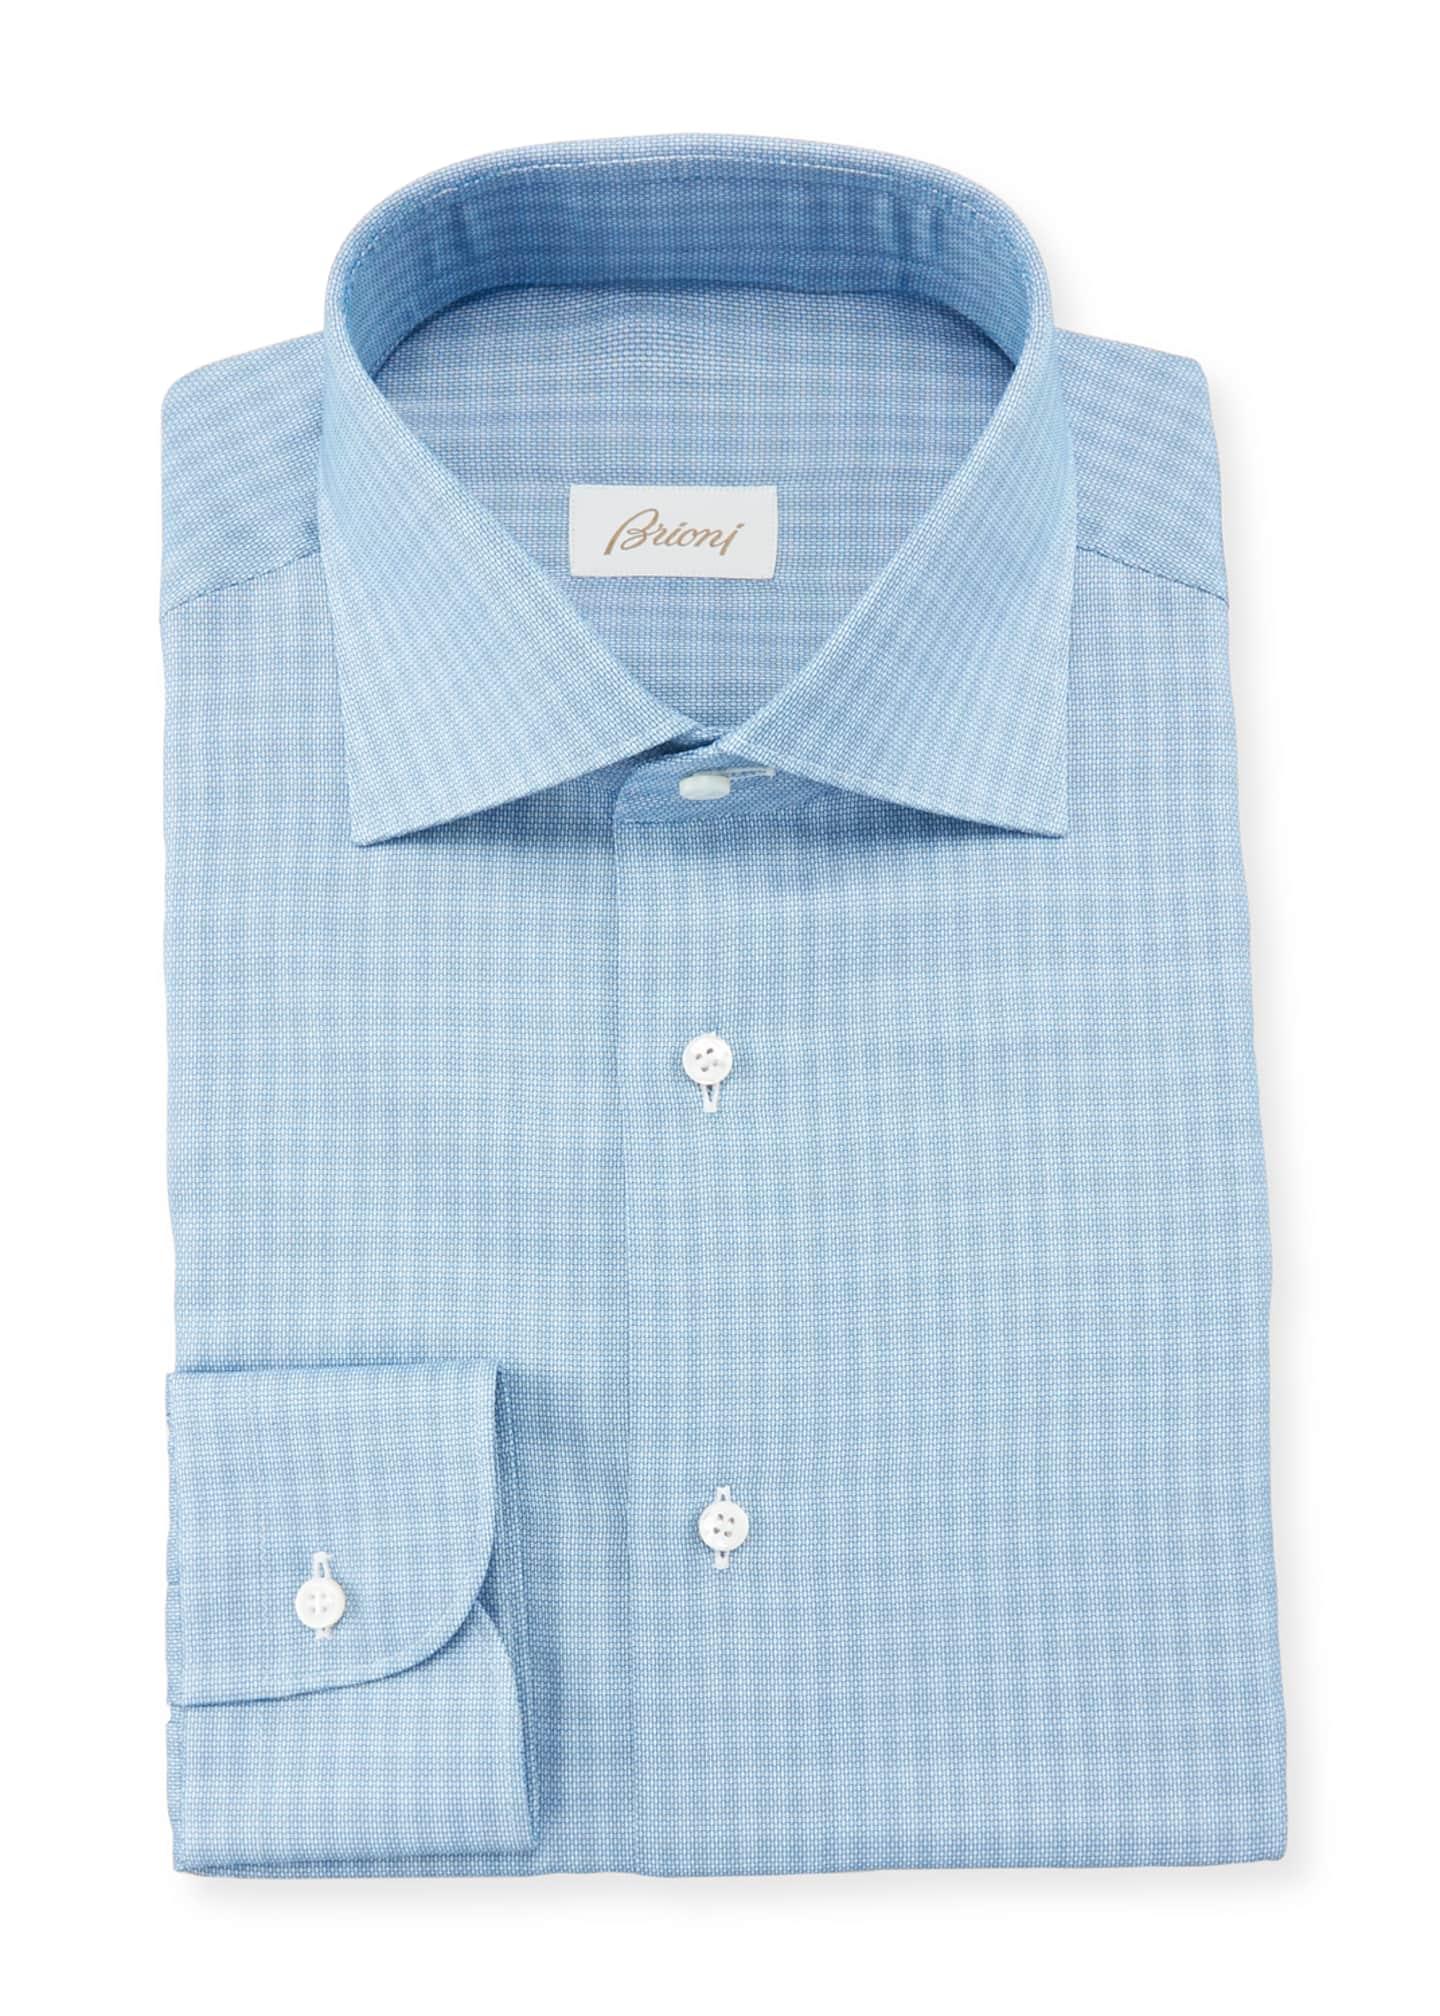 Brioni Men's Tonal Check Dress Shirt